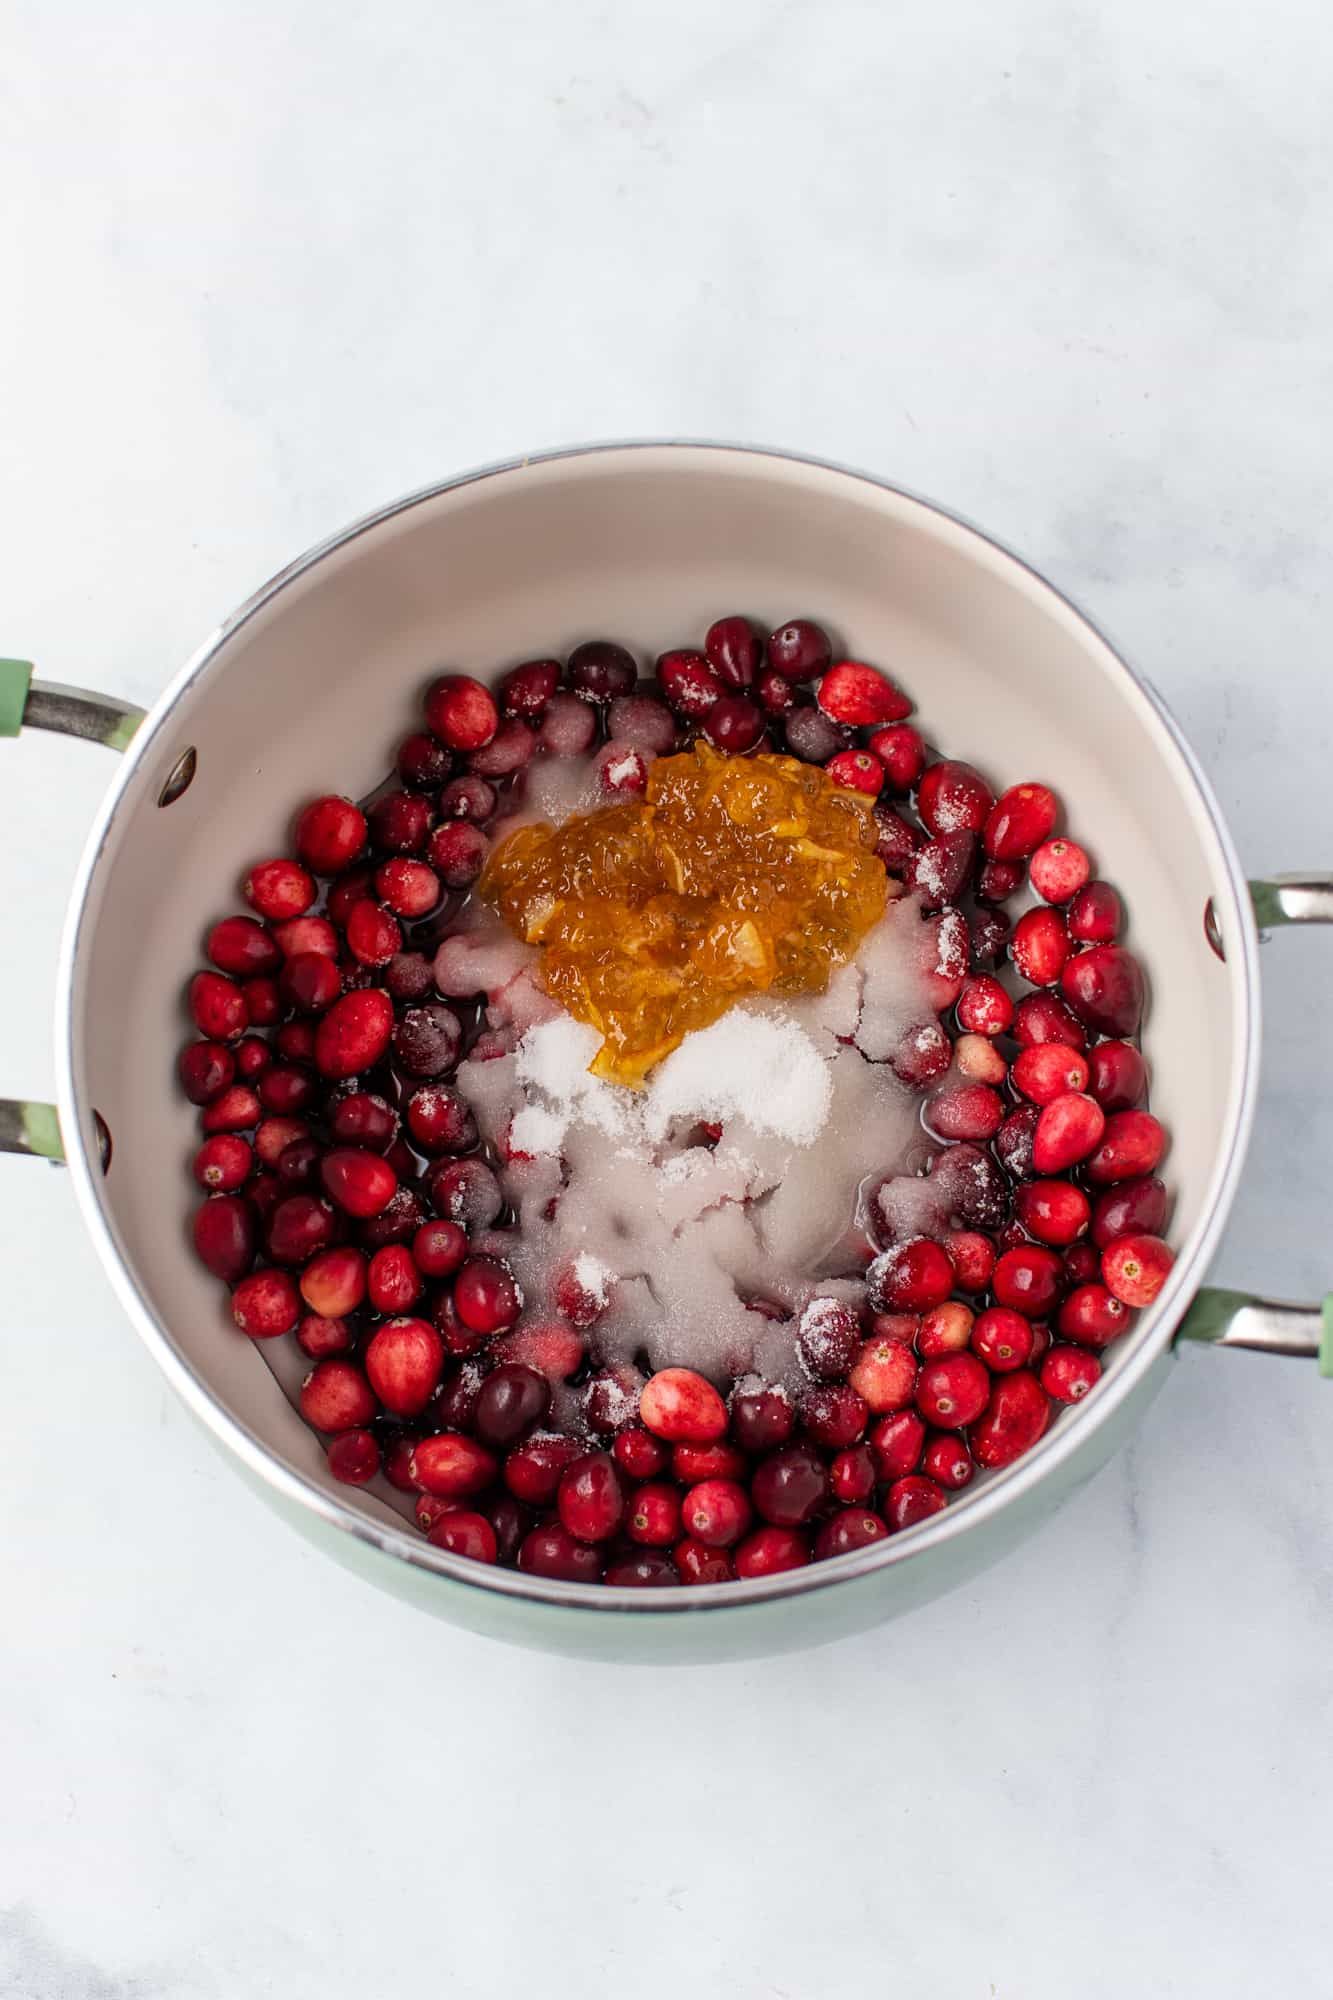 FRESH CRANBERRIES, WATER, SUGAR AND ORANGE MARMALADE IN A MEDIUM SAUCE PAN.